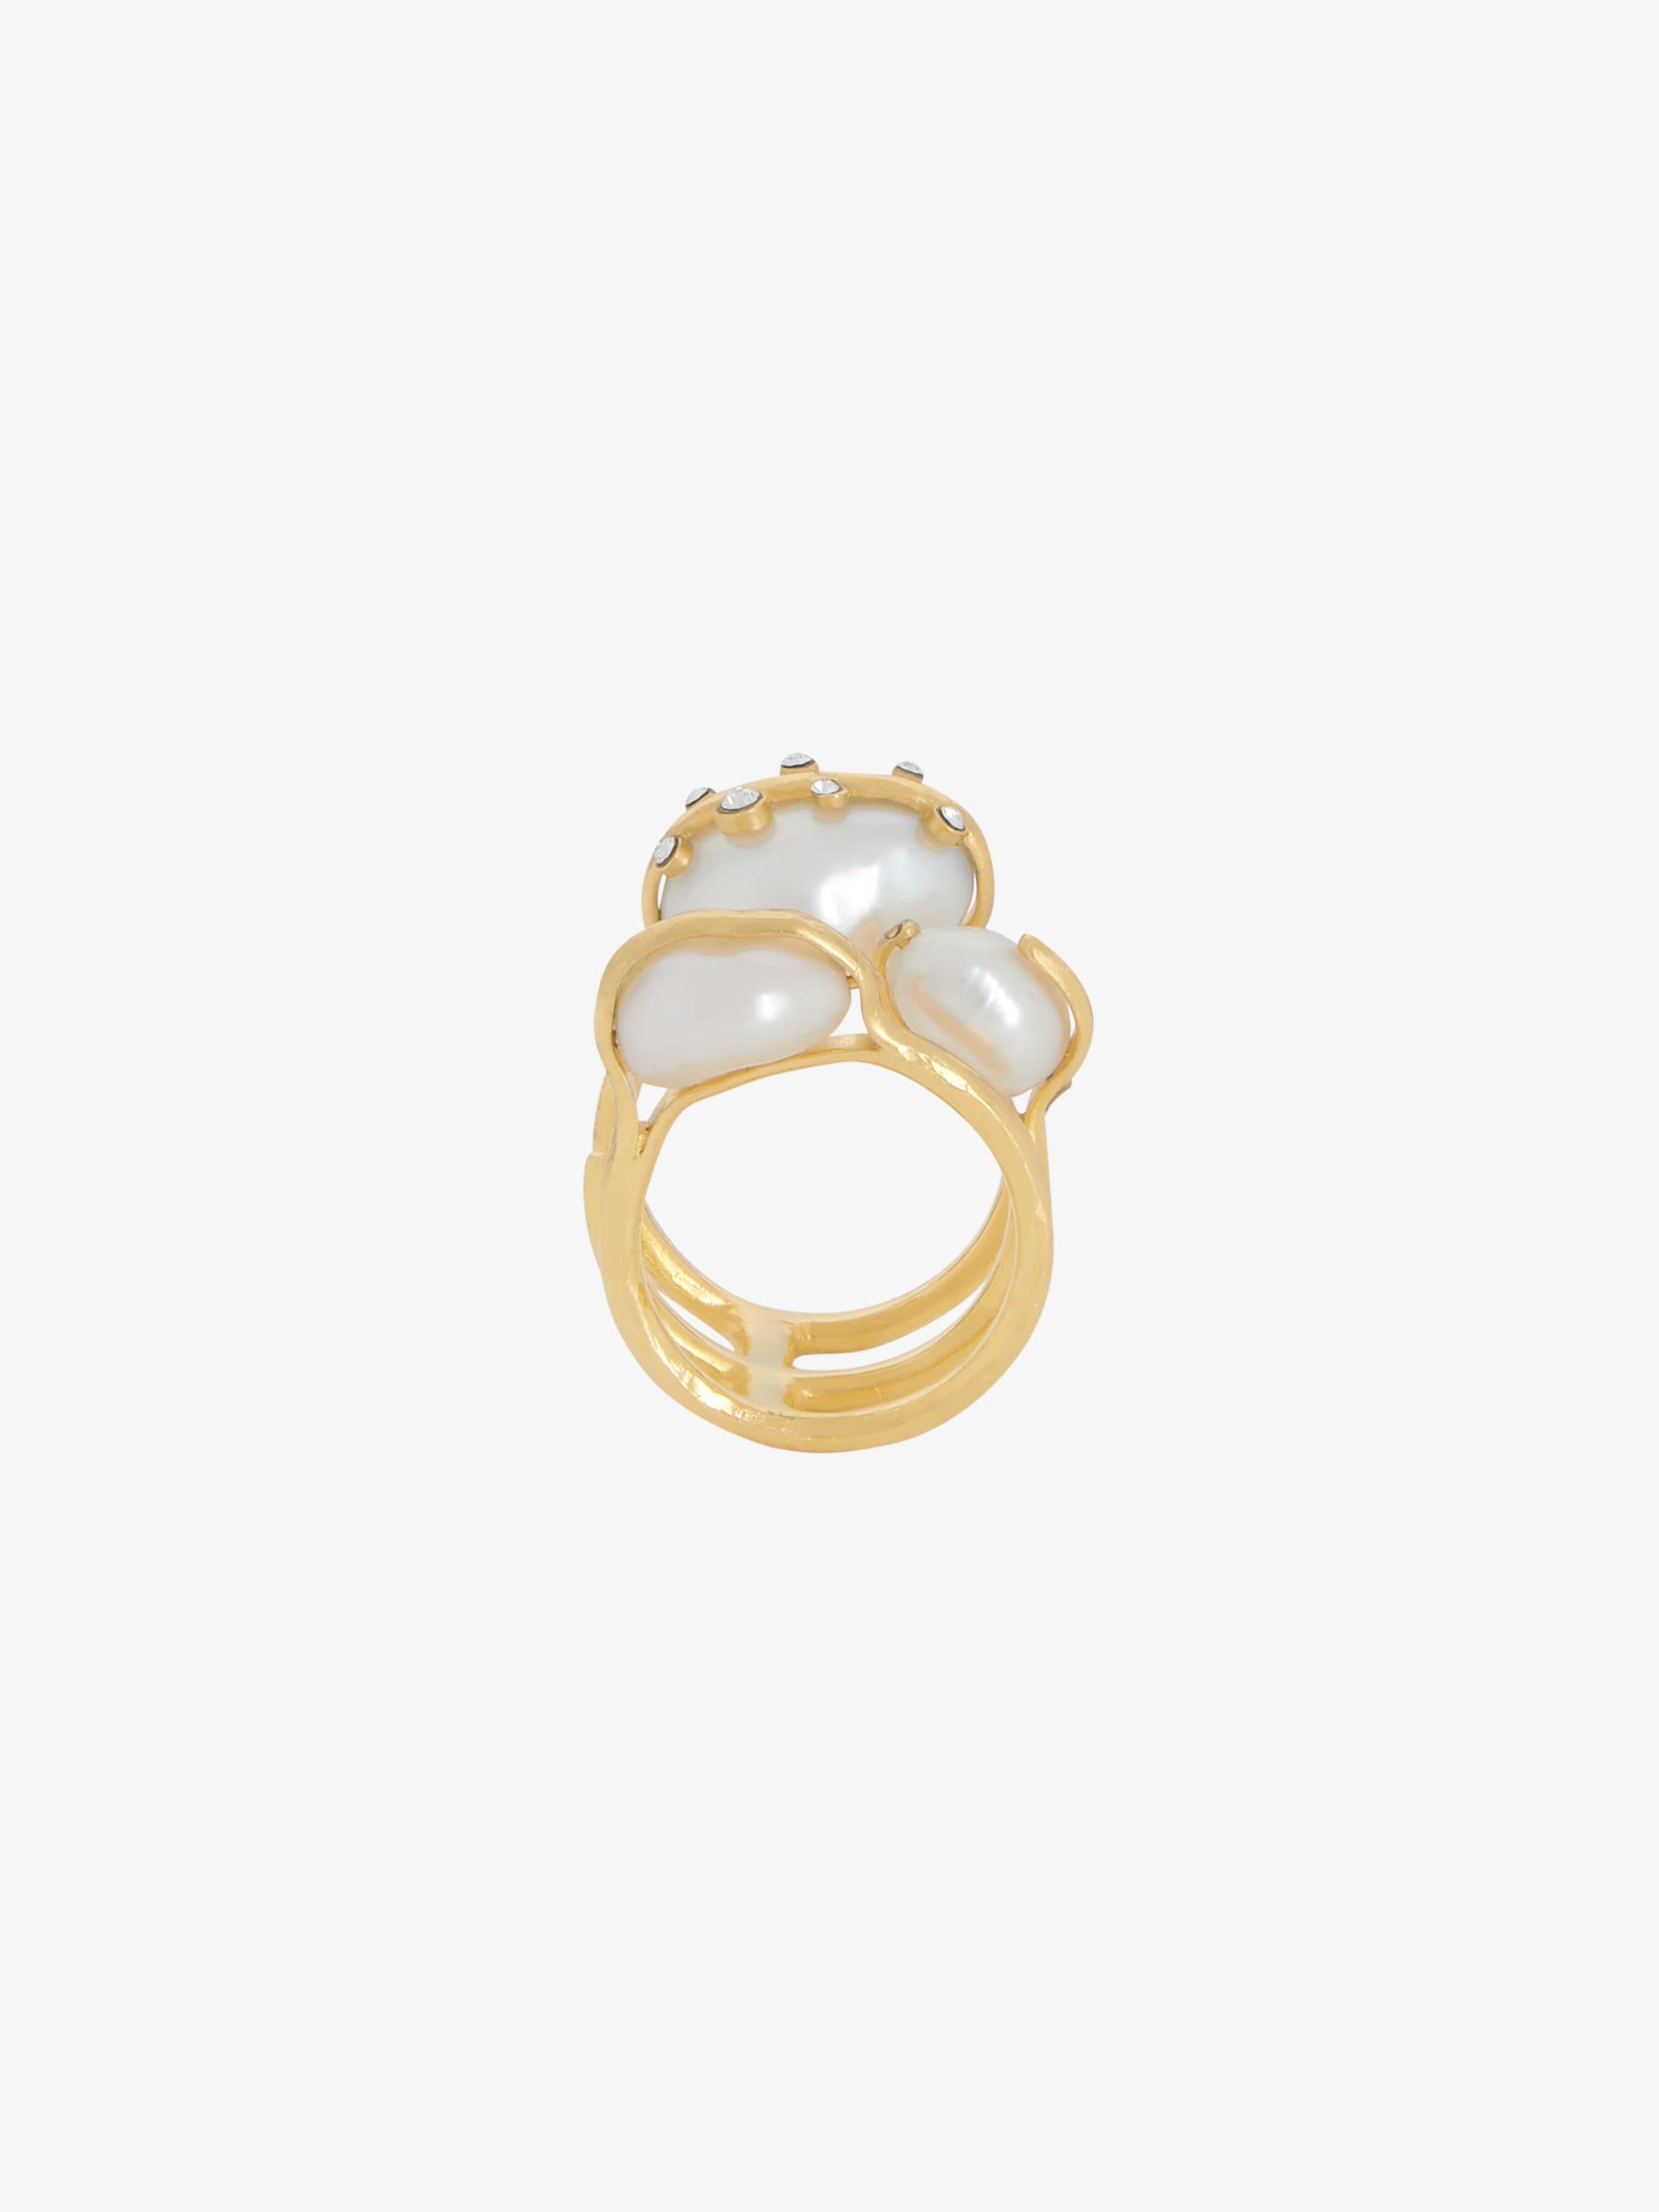 Midnight Pearl triple ring